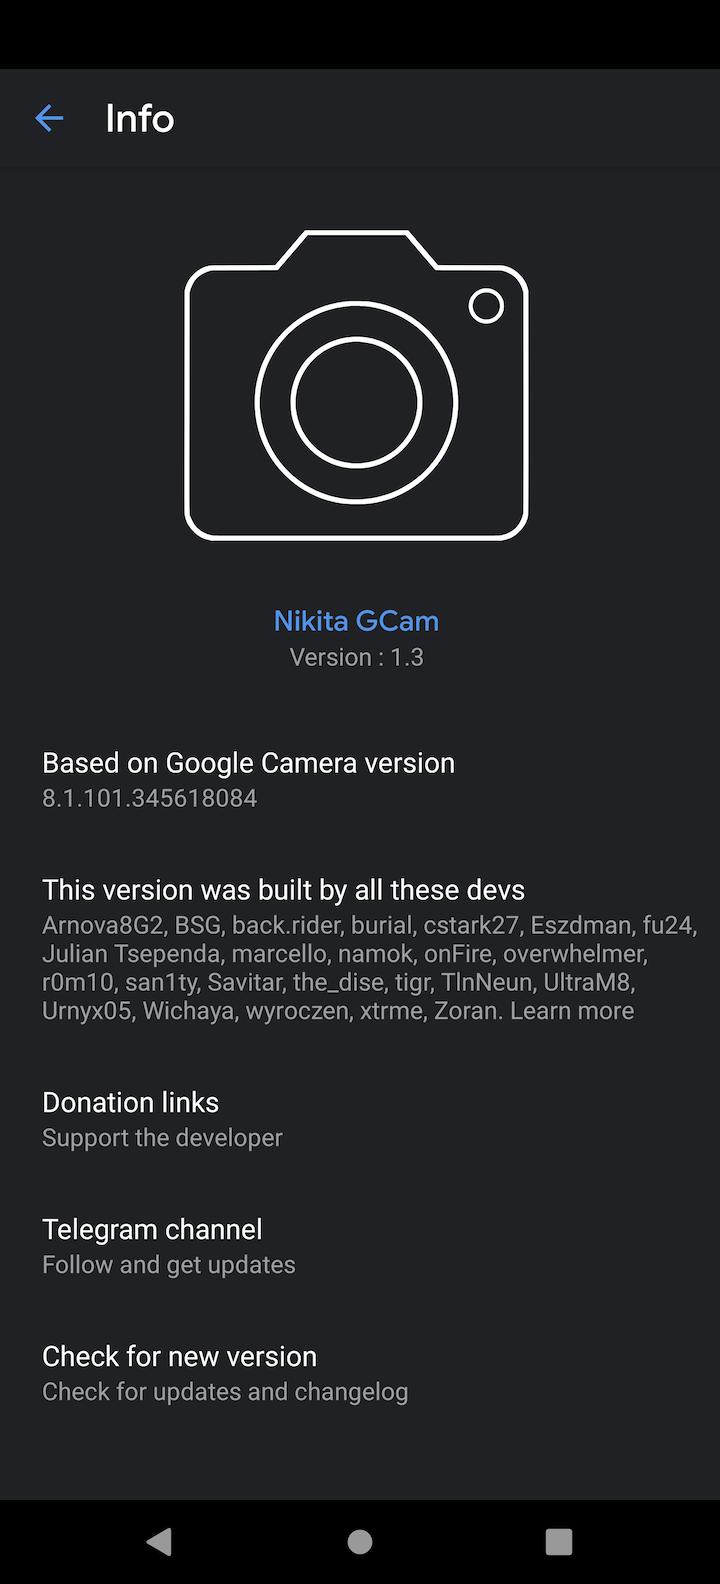 NGCam_8.1.101-v1.3-fix